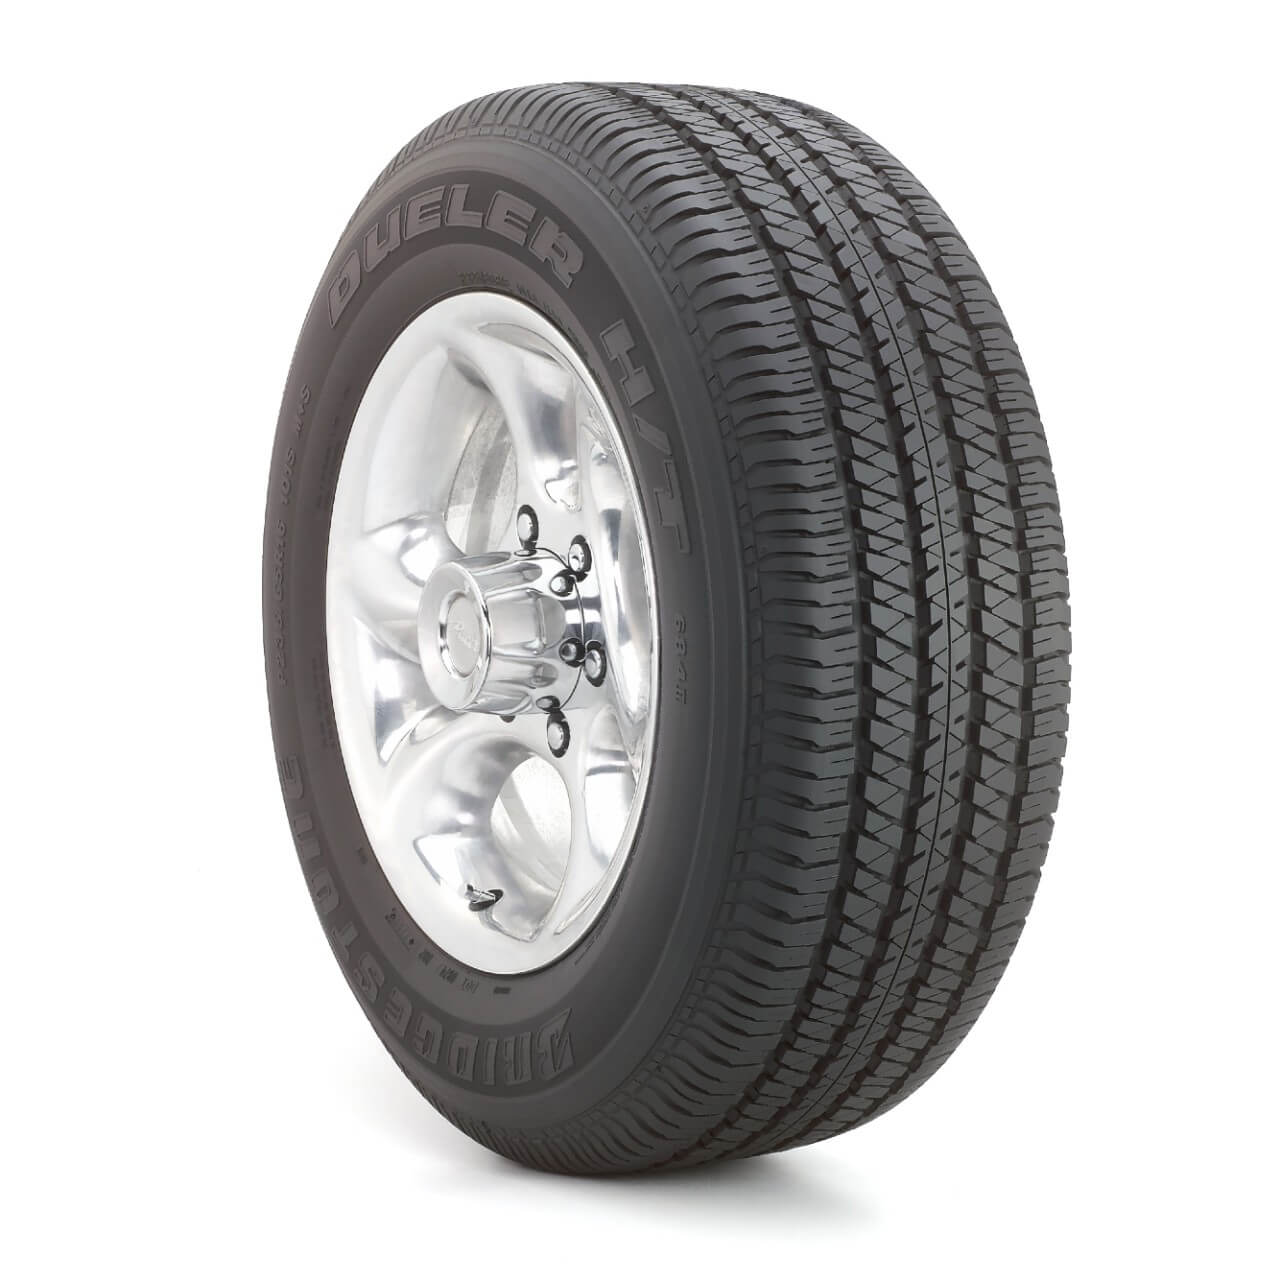 Bridgestone Dueler H/T 684 II  265/65 R17